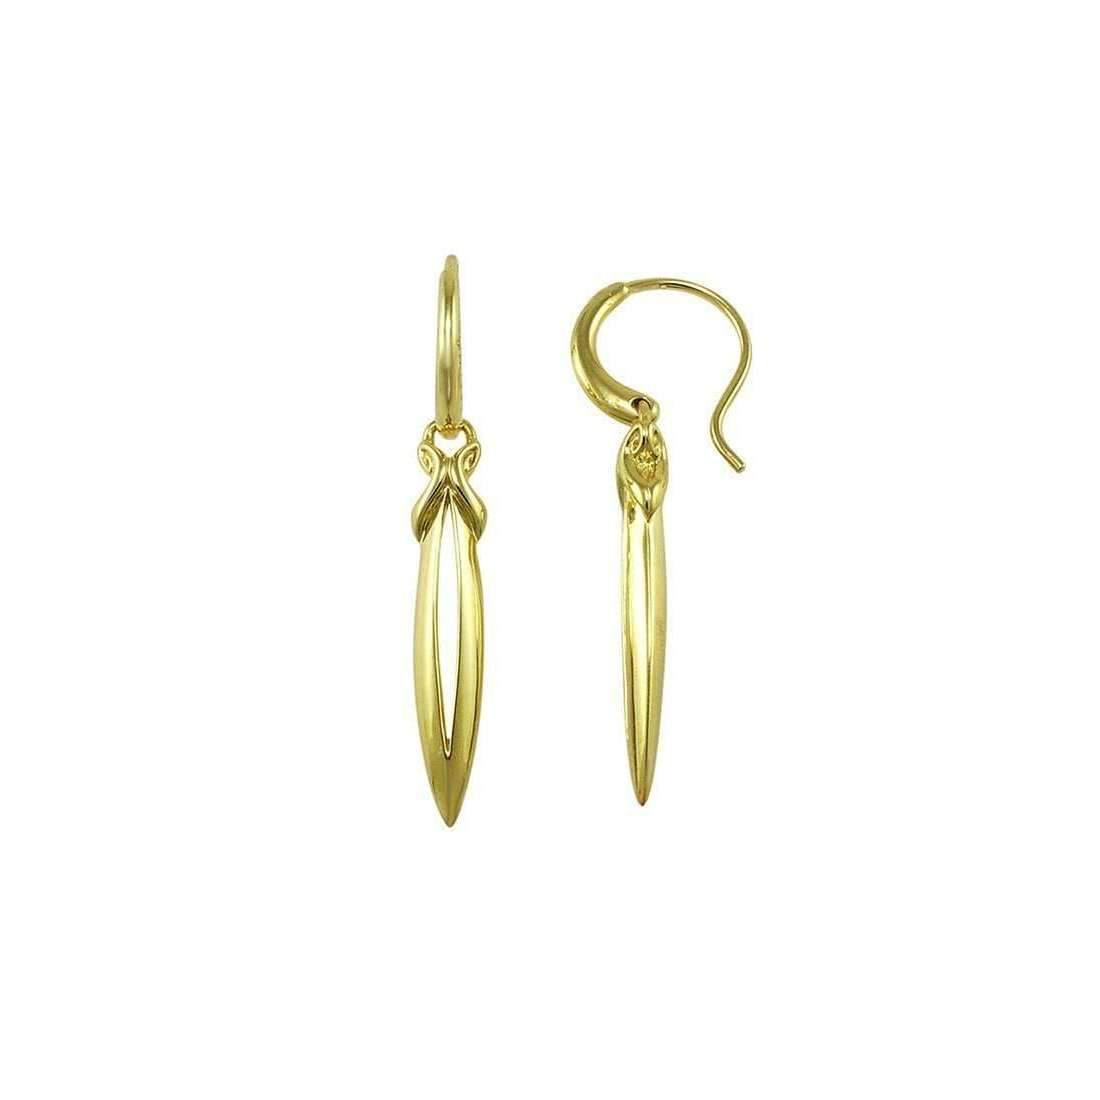 Realm Empire Petite Stiletto Earring 2HIZ7xQKxB